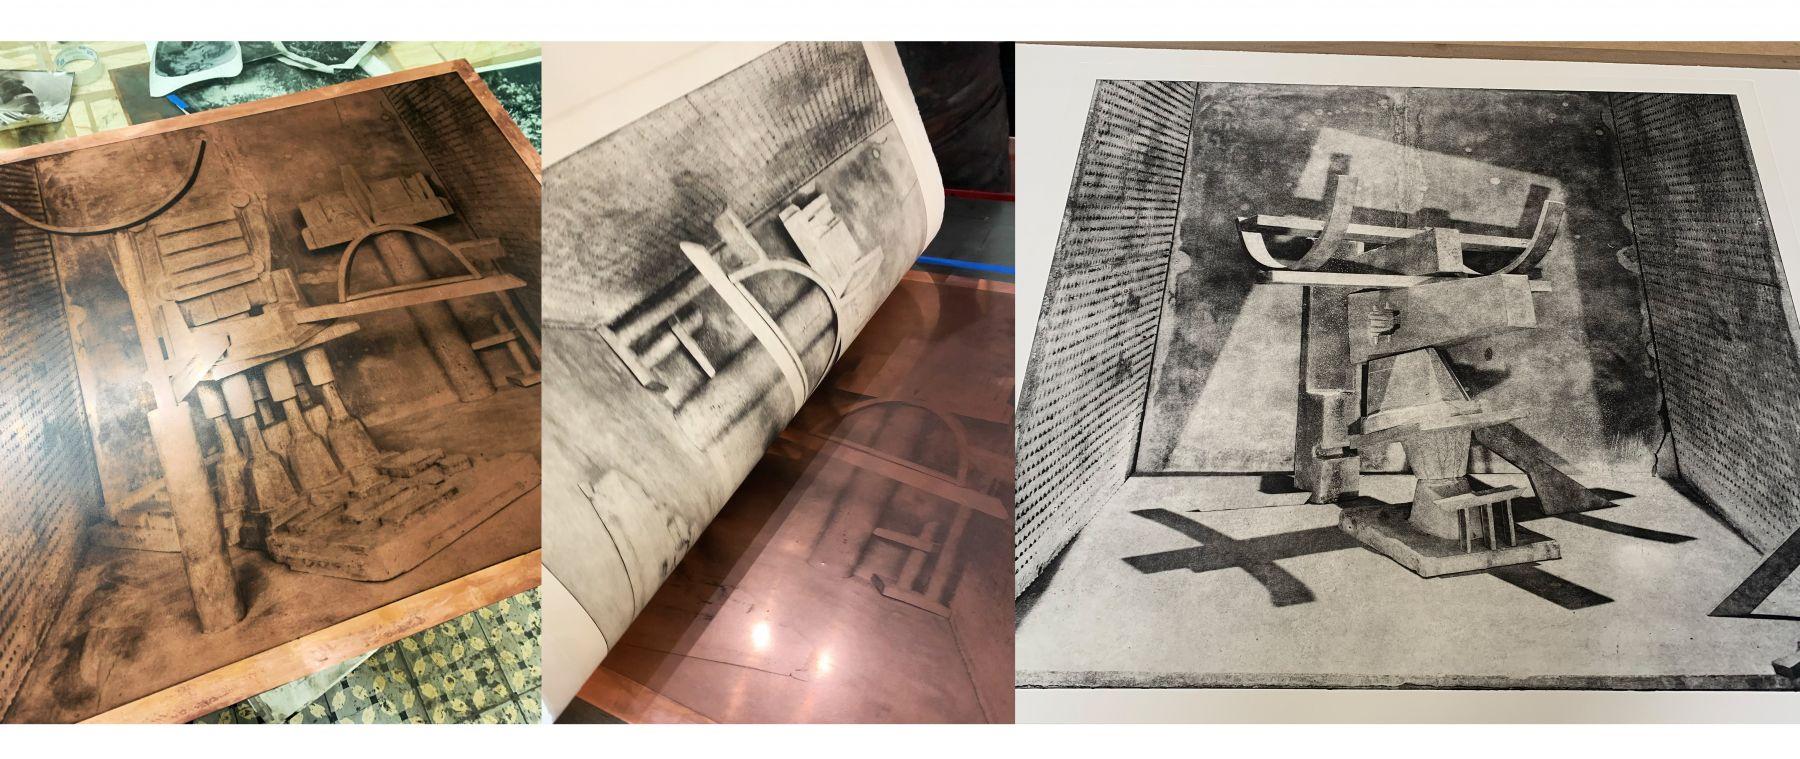 Photogravure process image